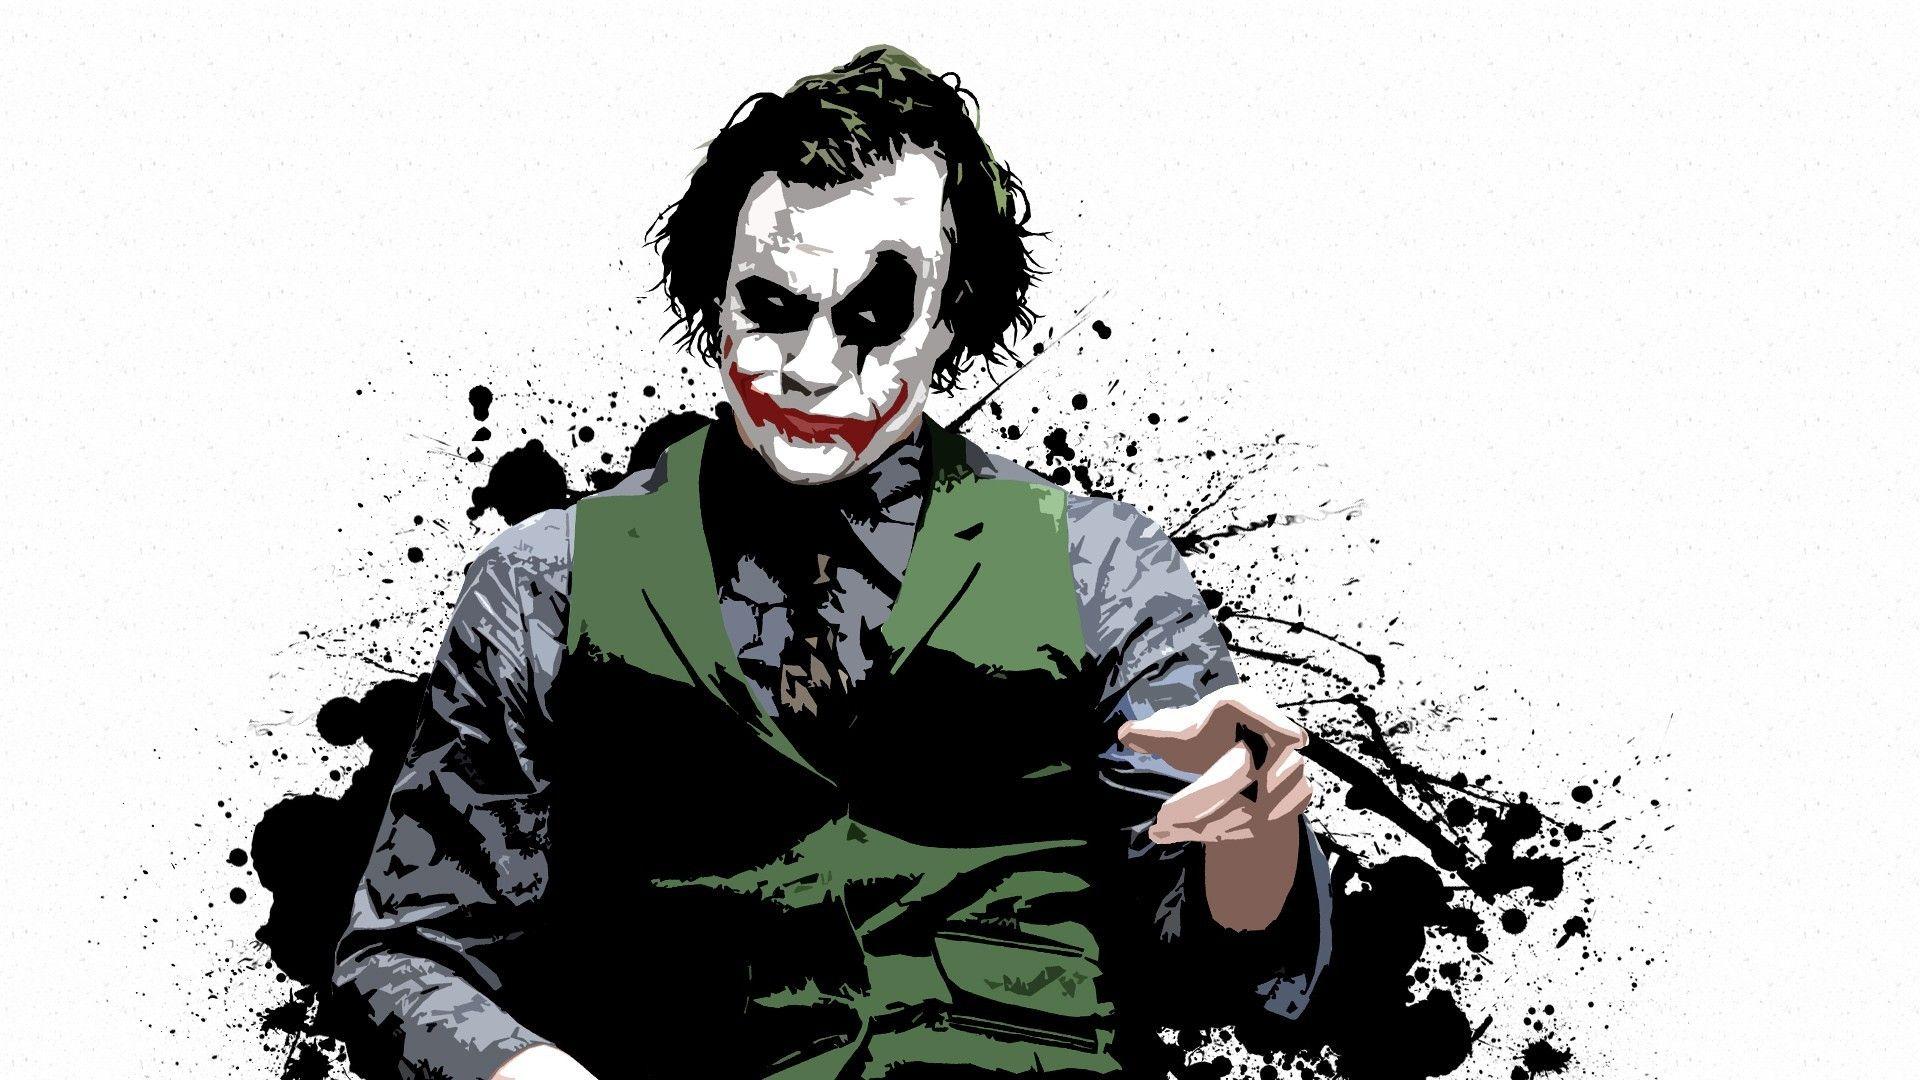 Joker Wallpaper 31 HD Pics